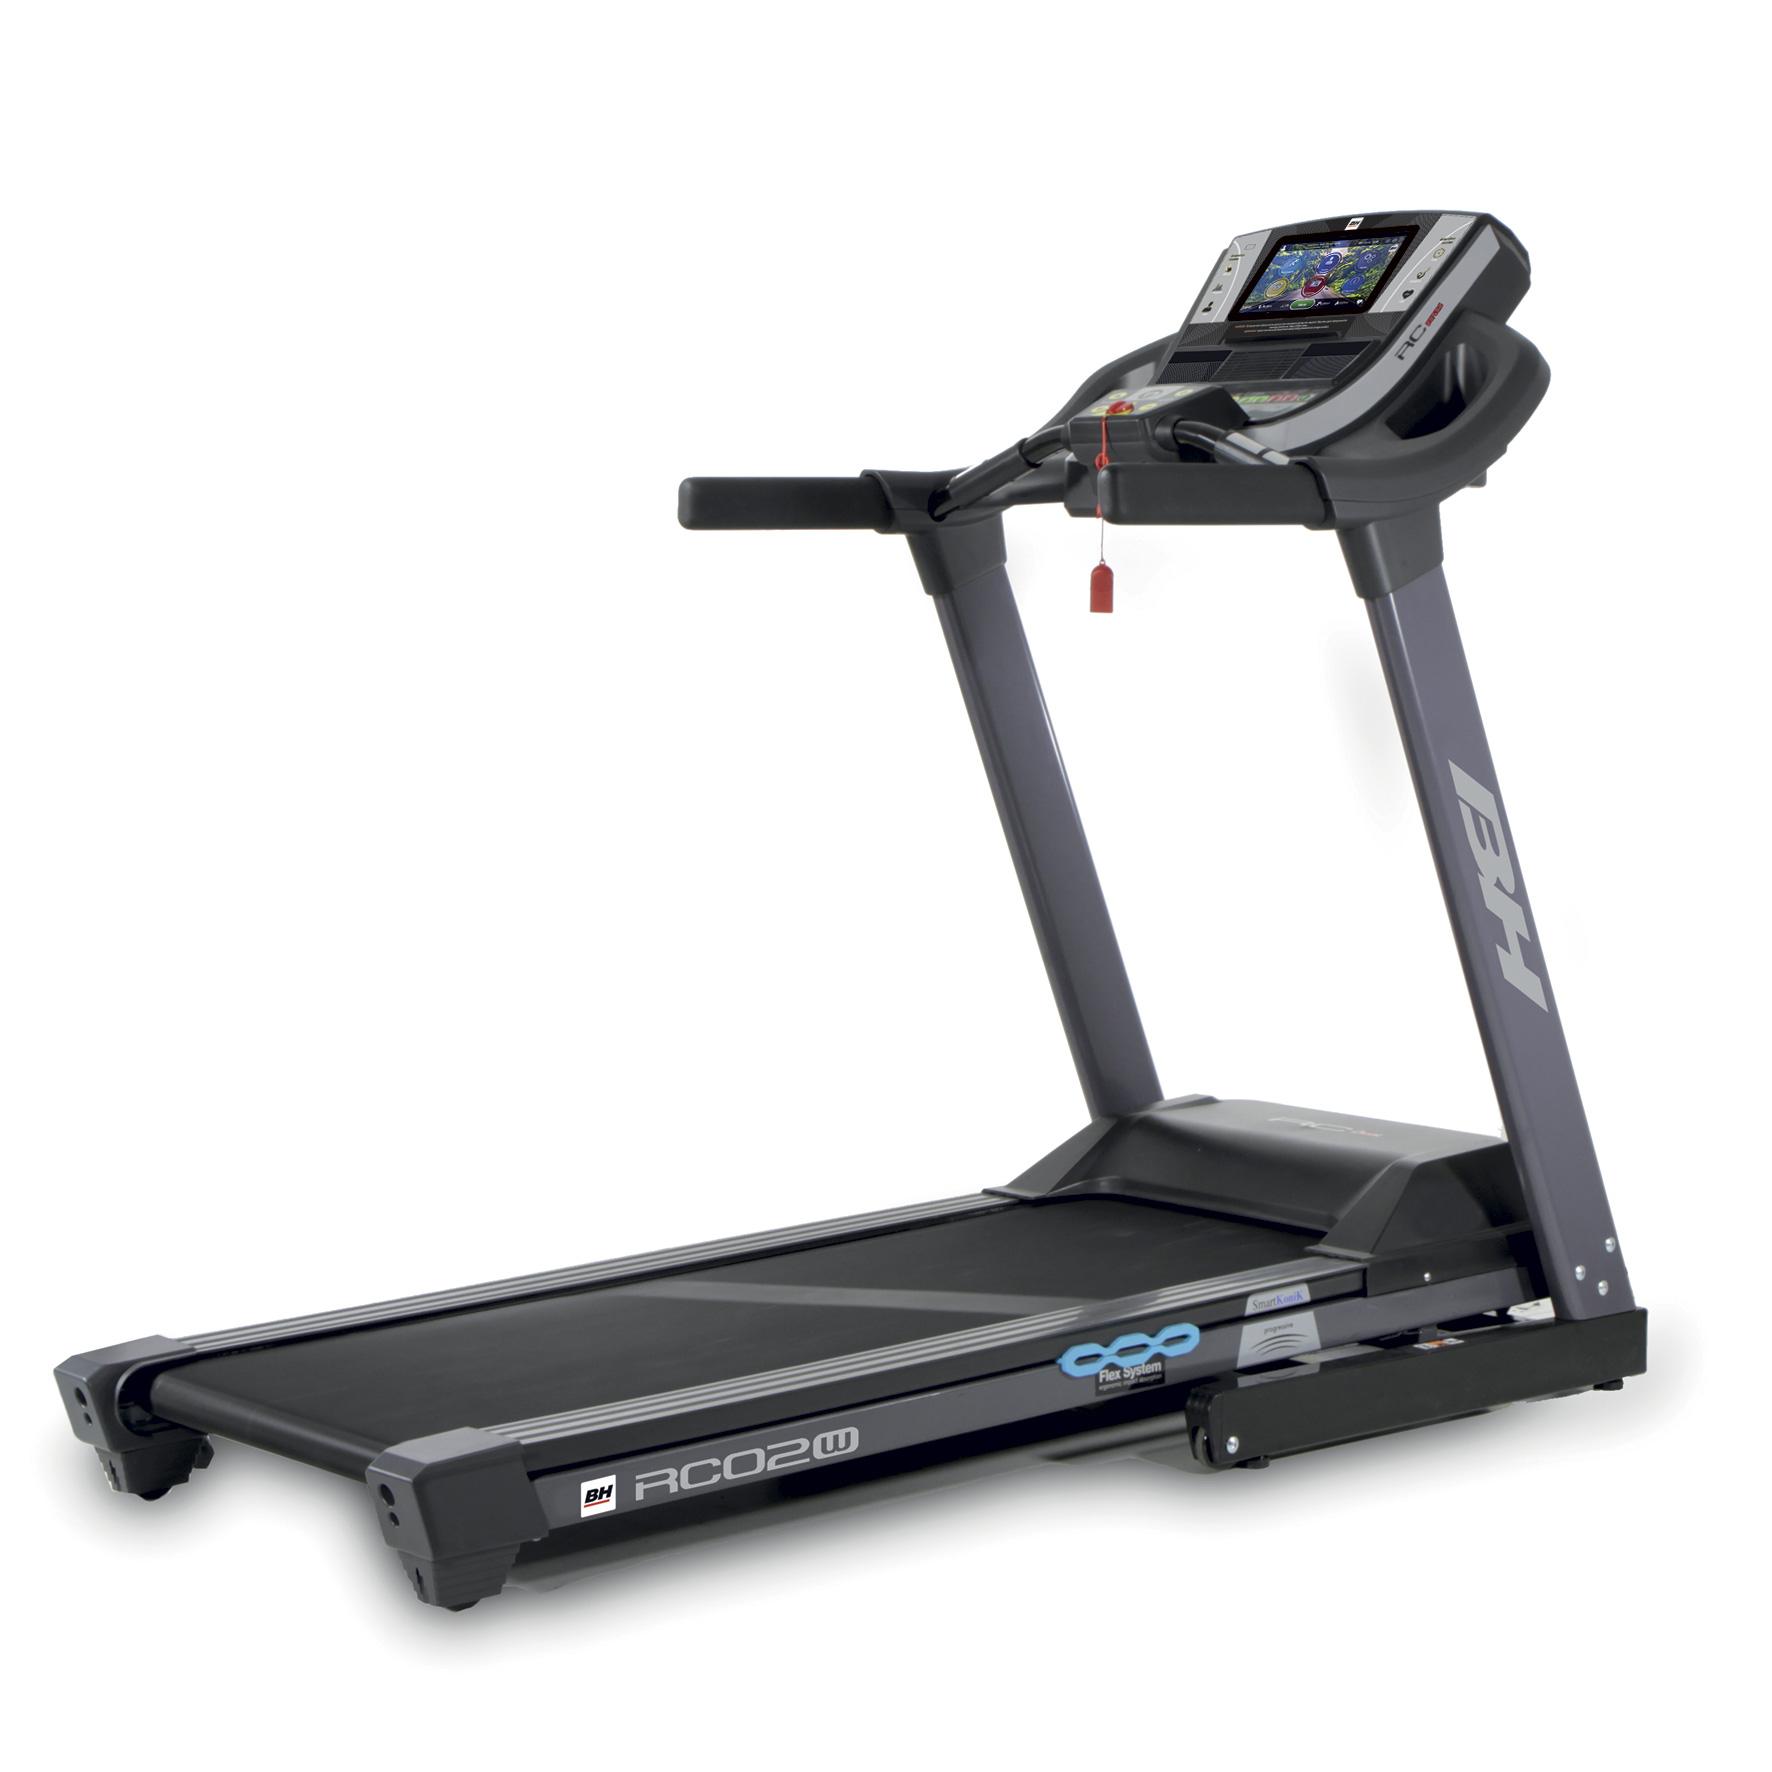 Bh fitness RC02W TFT